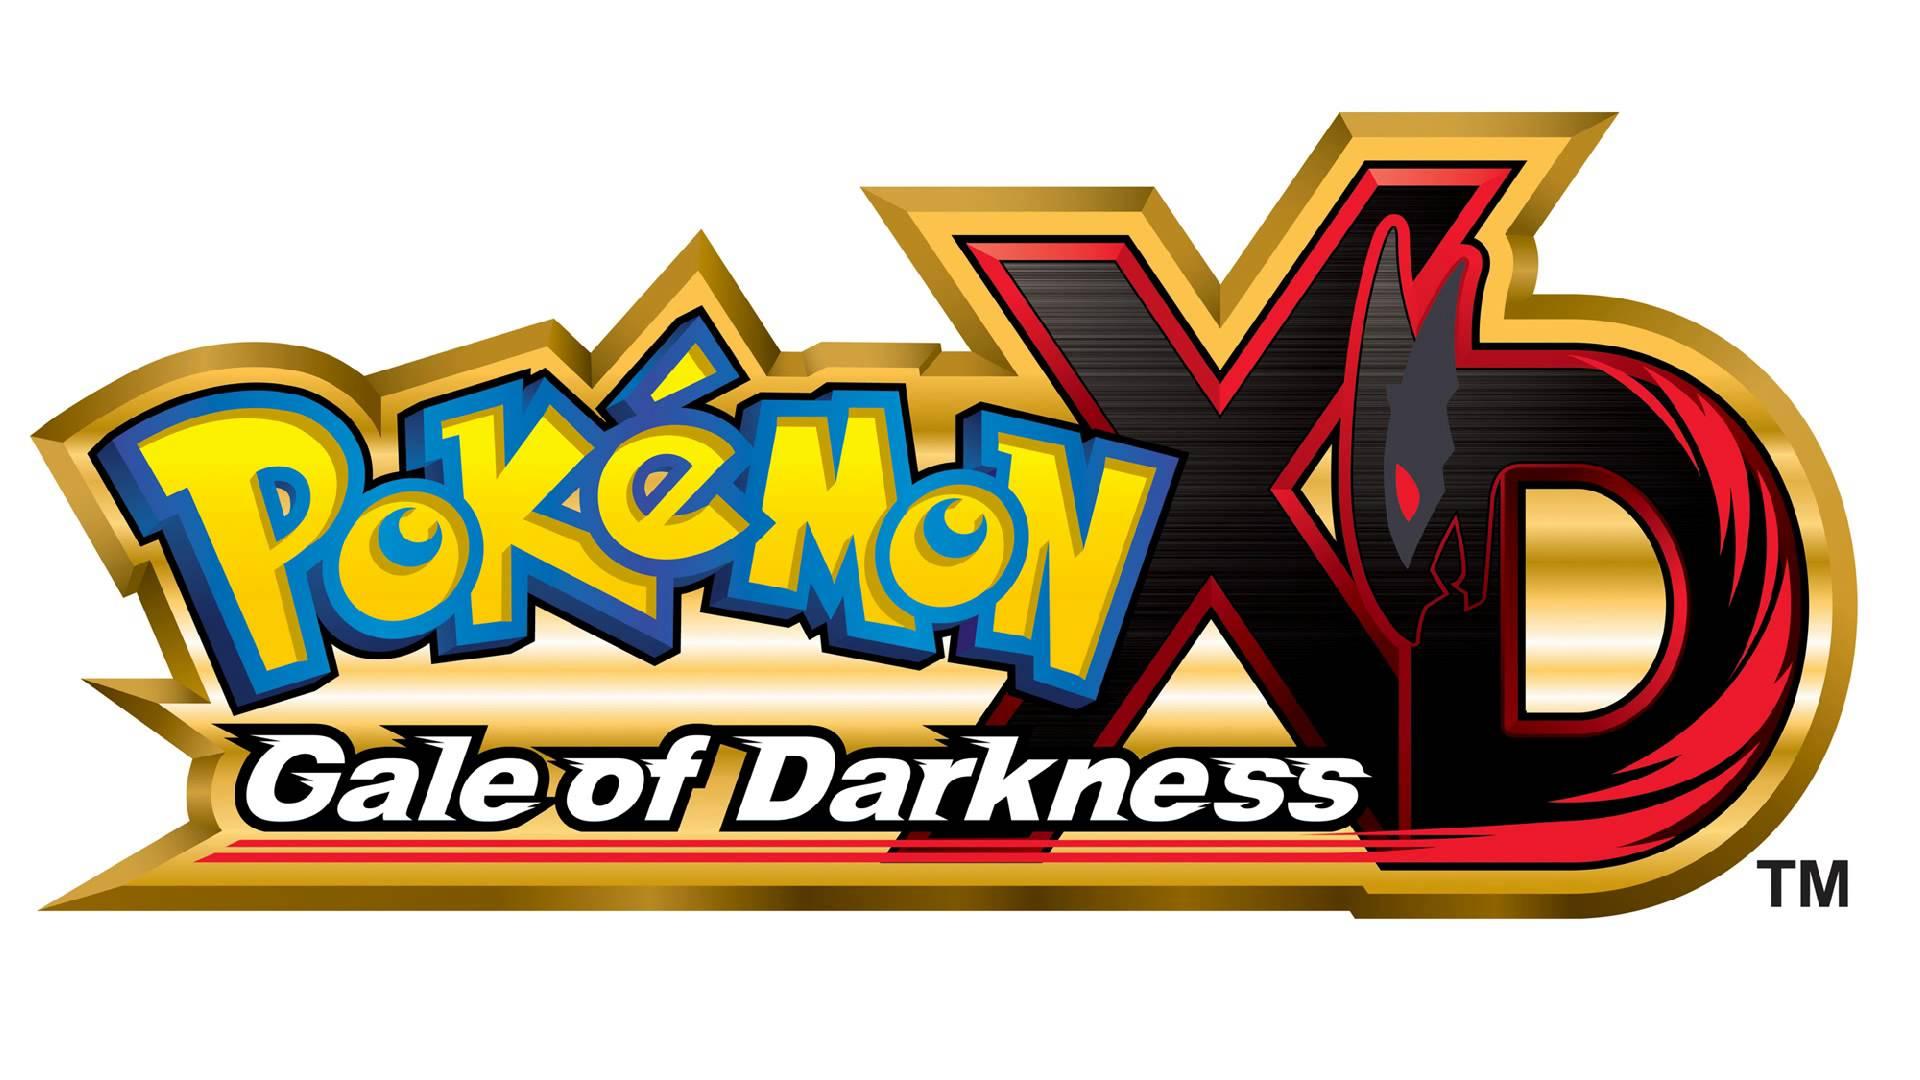 Battle SIM - Pokémon XD: Gale of Darkness